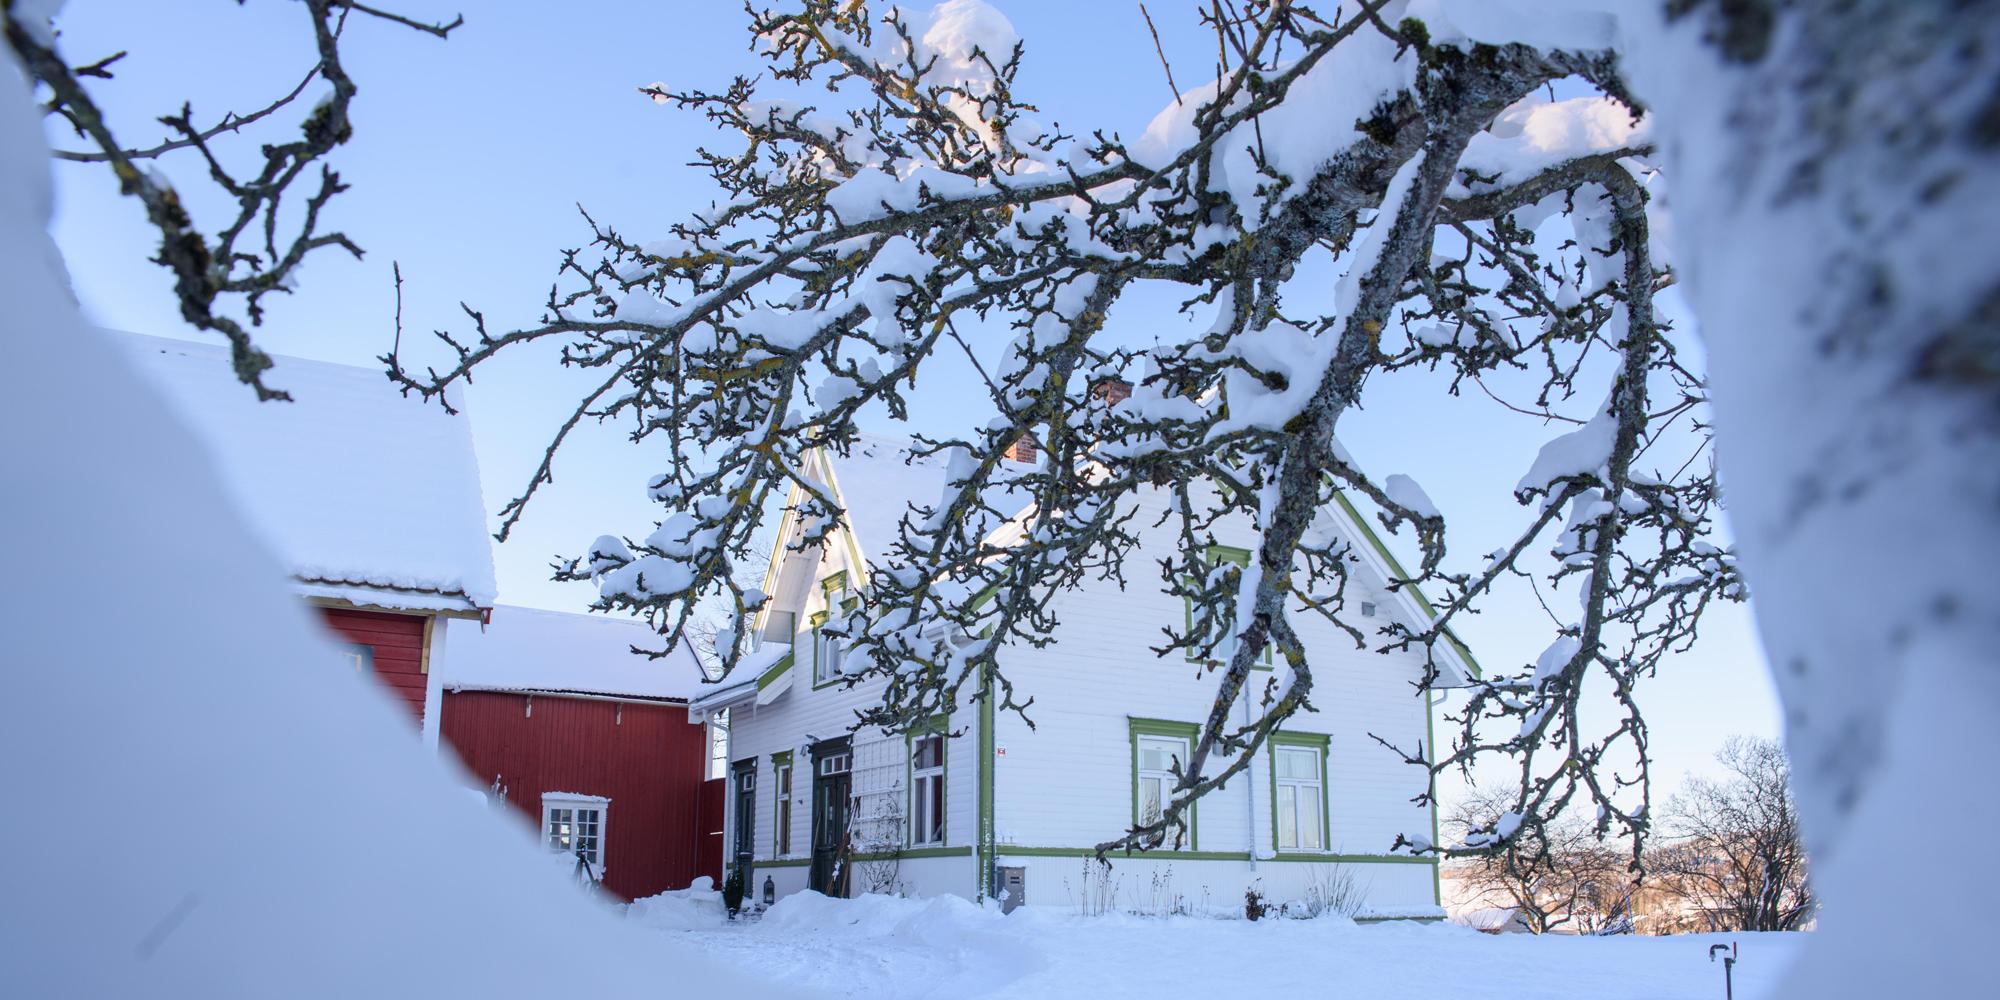 Strømnes - Great Grandfathers house in winter. Copyright: Strømnes